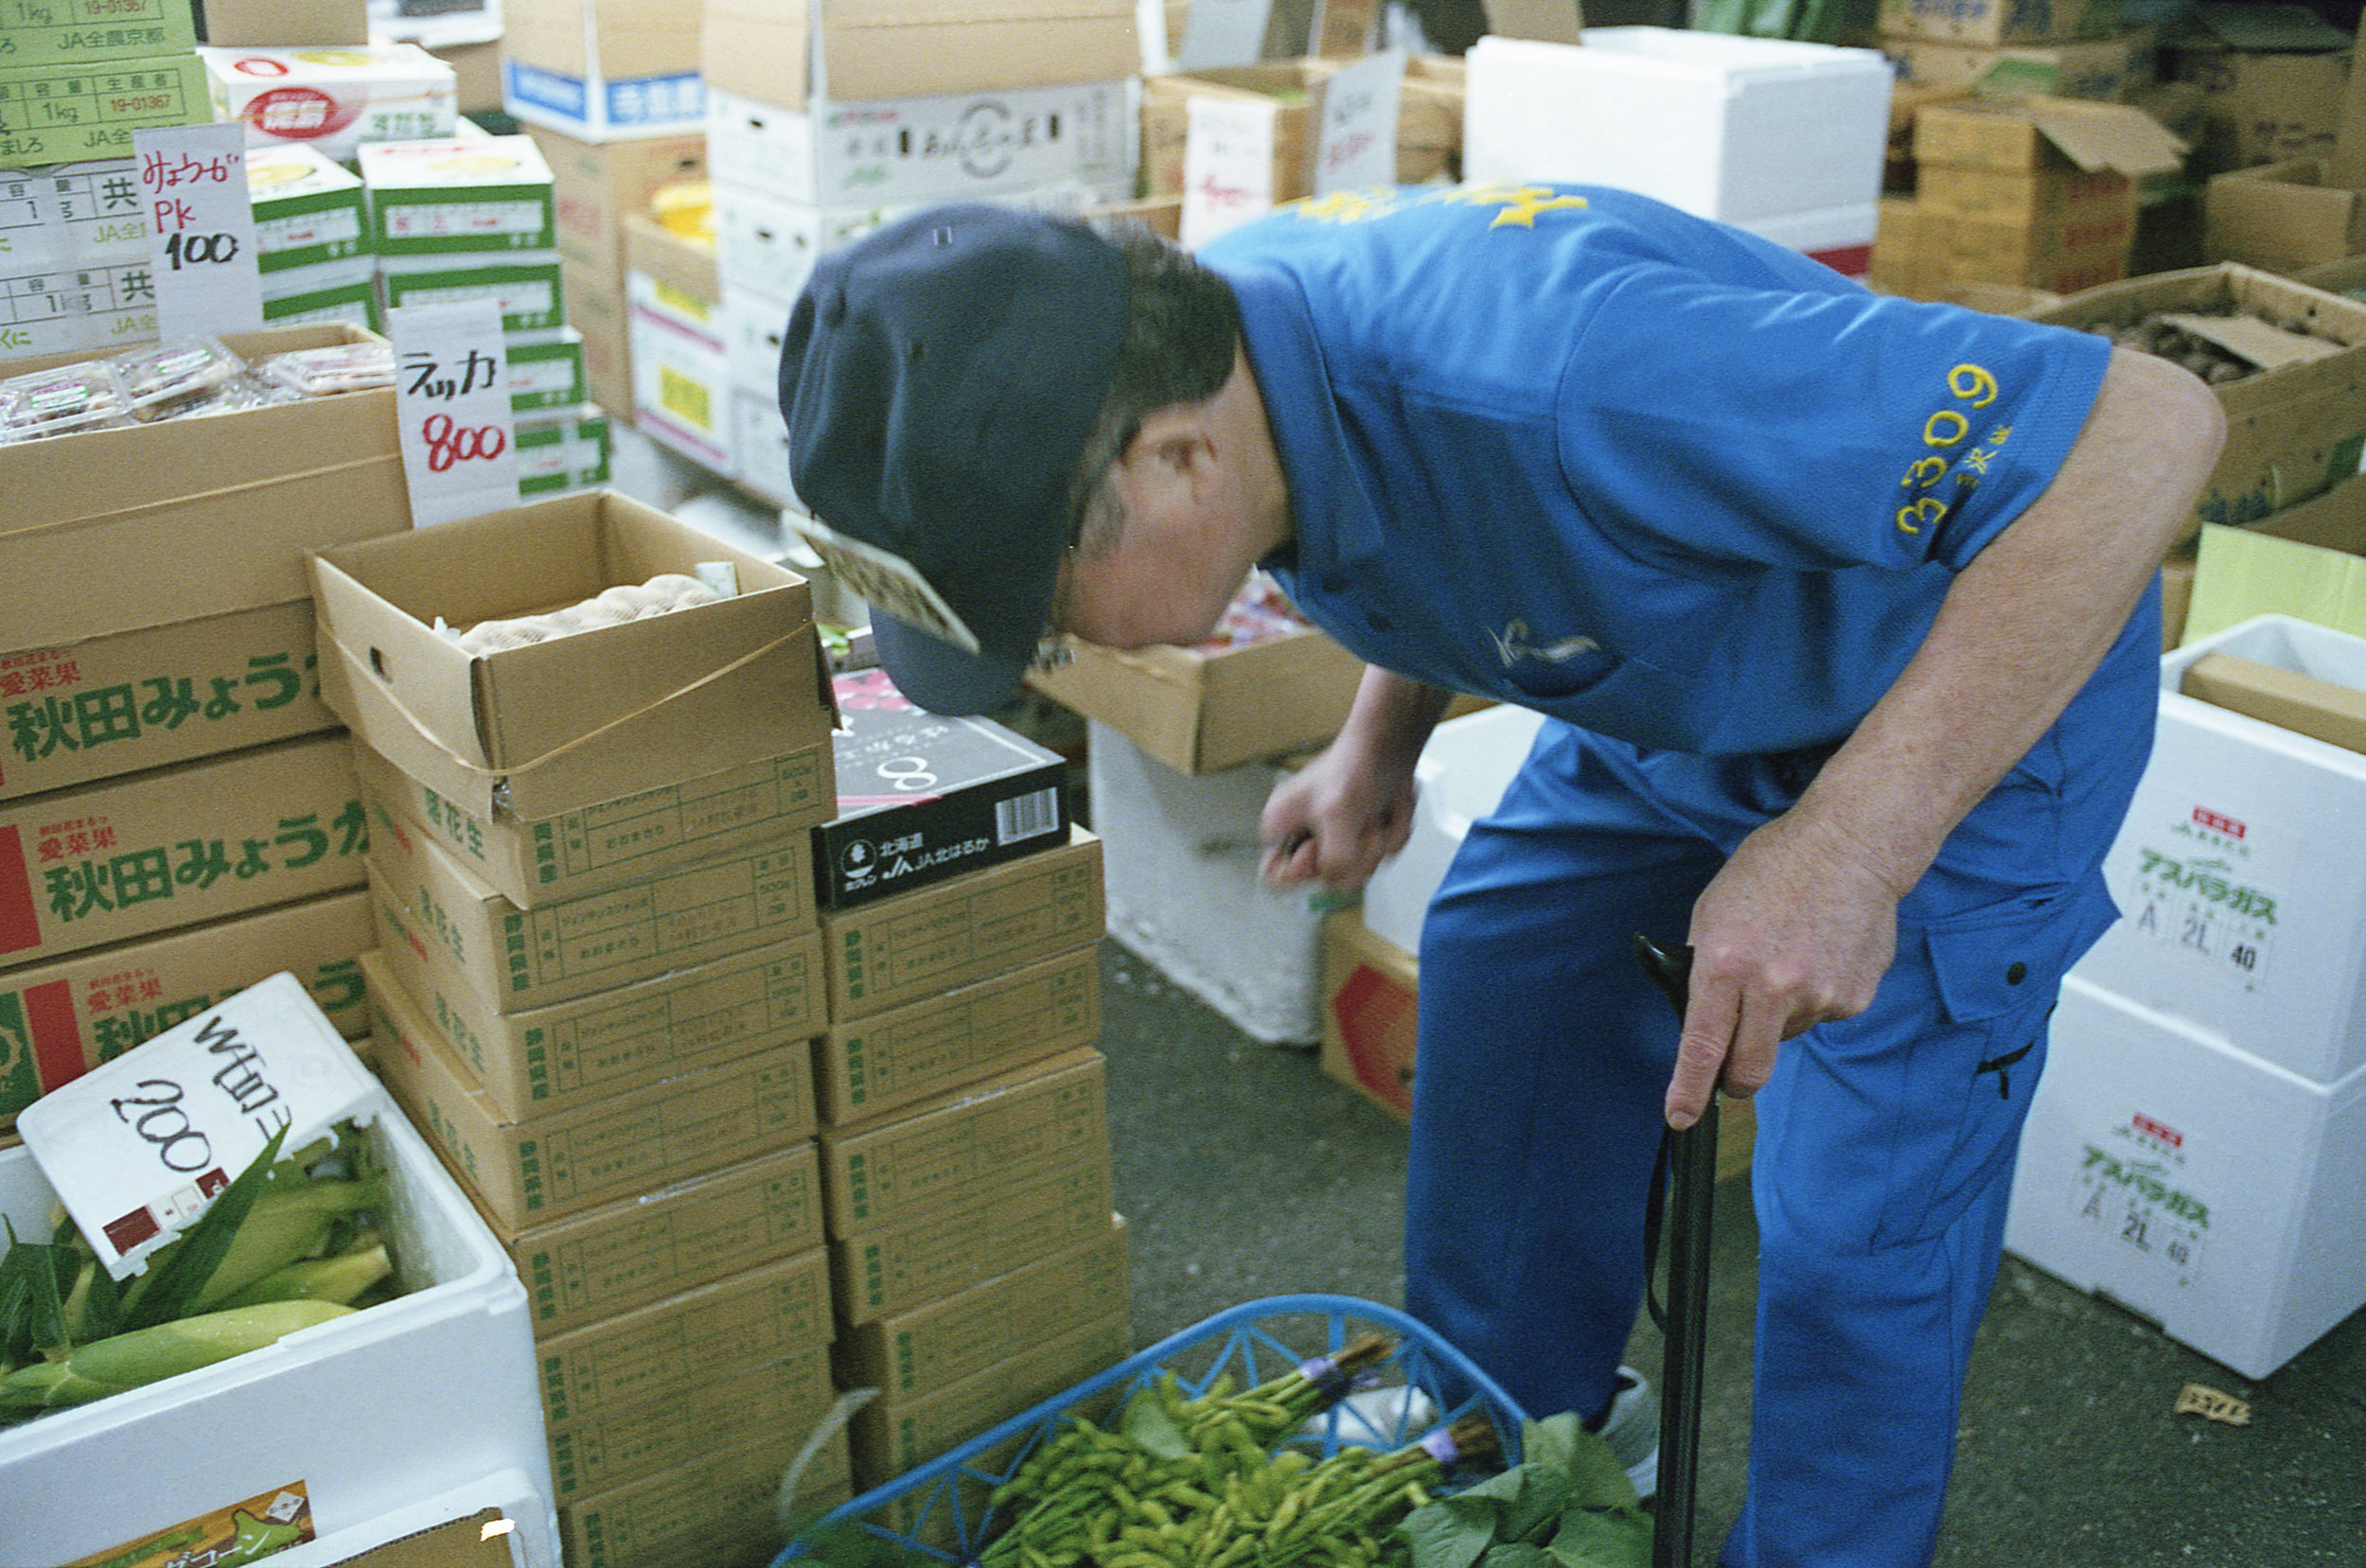 20180830_TsukijiMarket_019.jpg